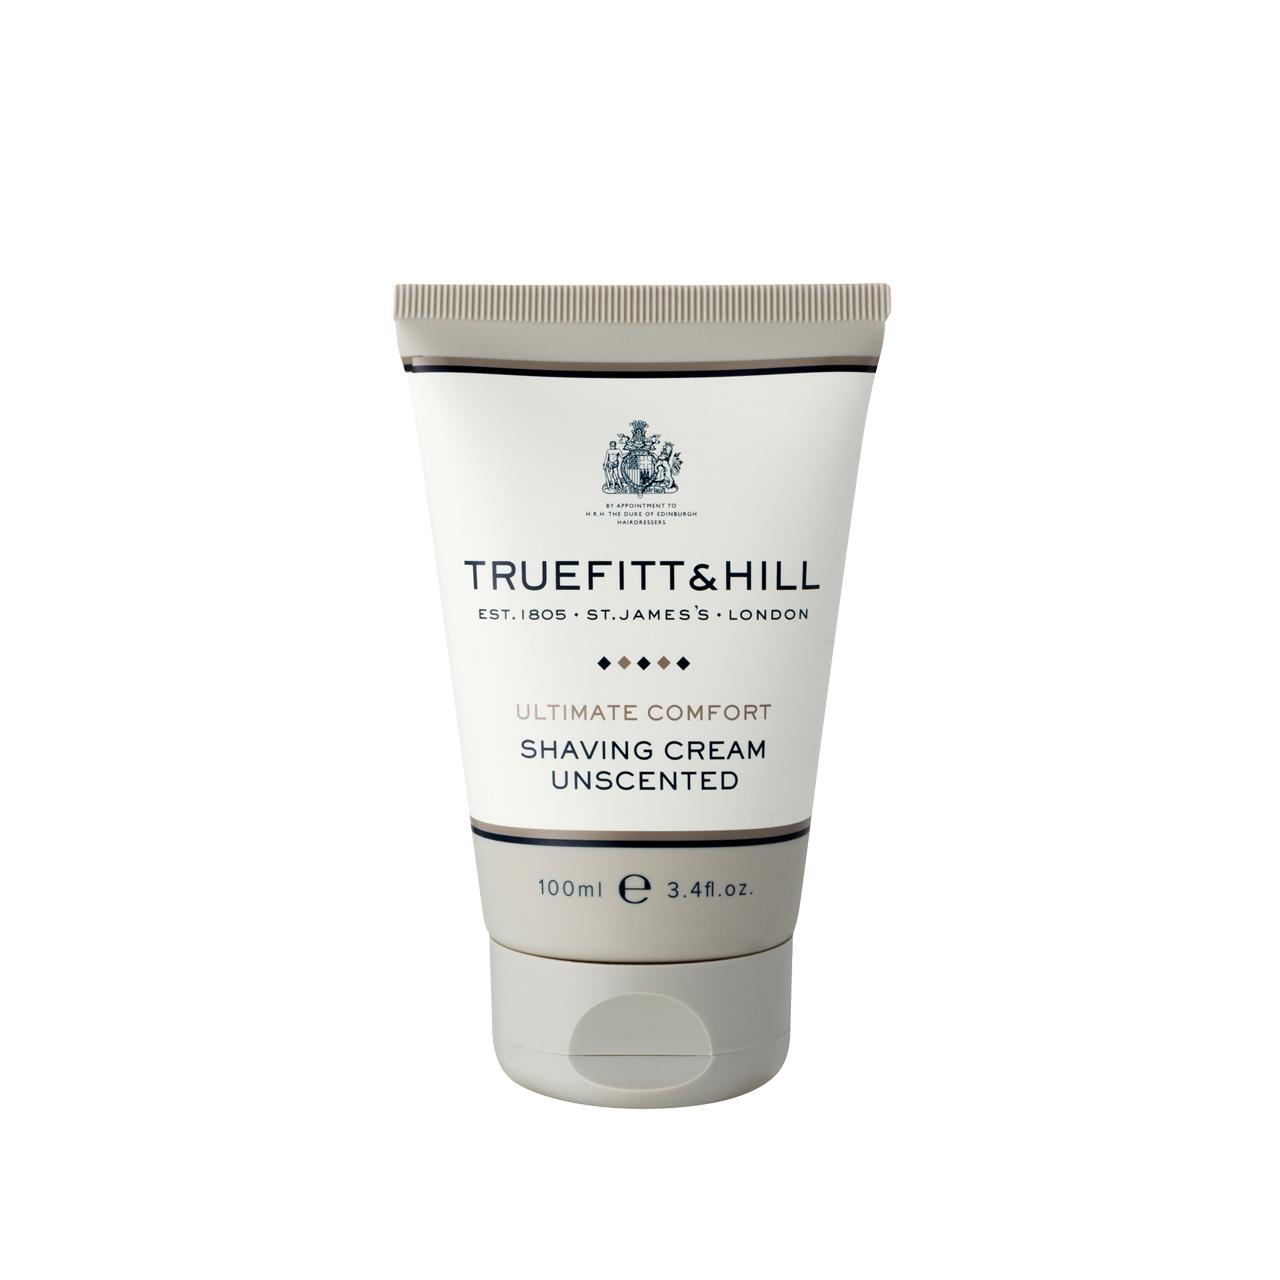 Ultimate Comfort - Shaving Cream Tube